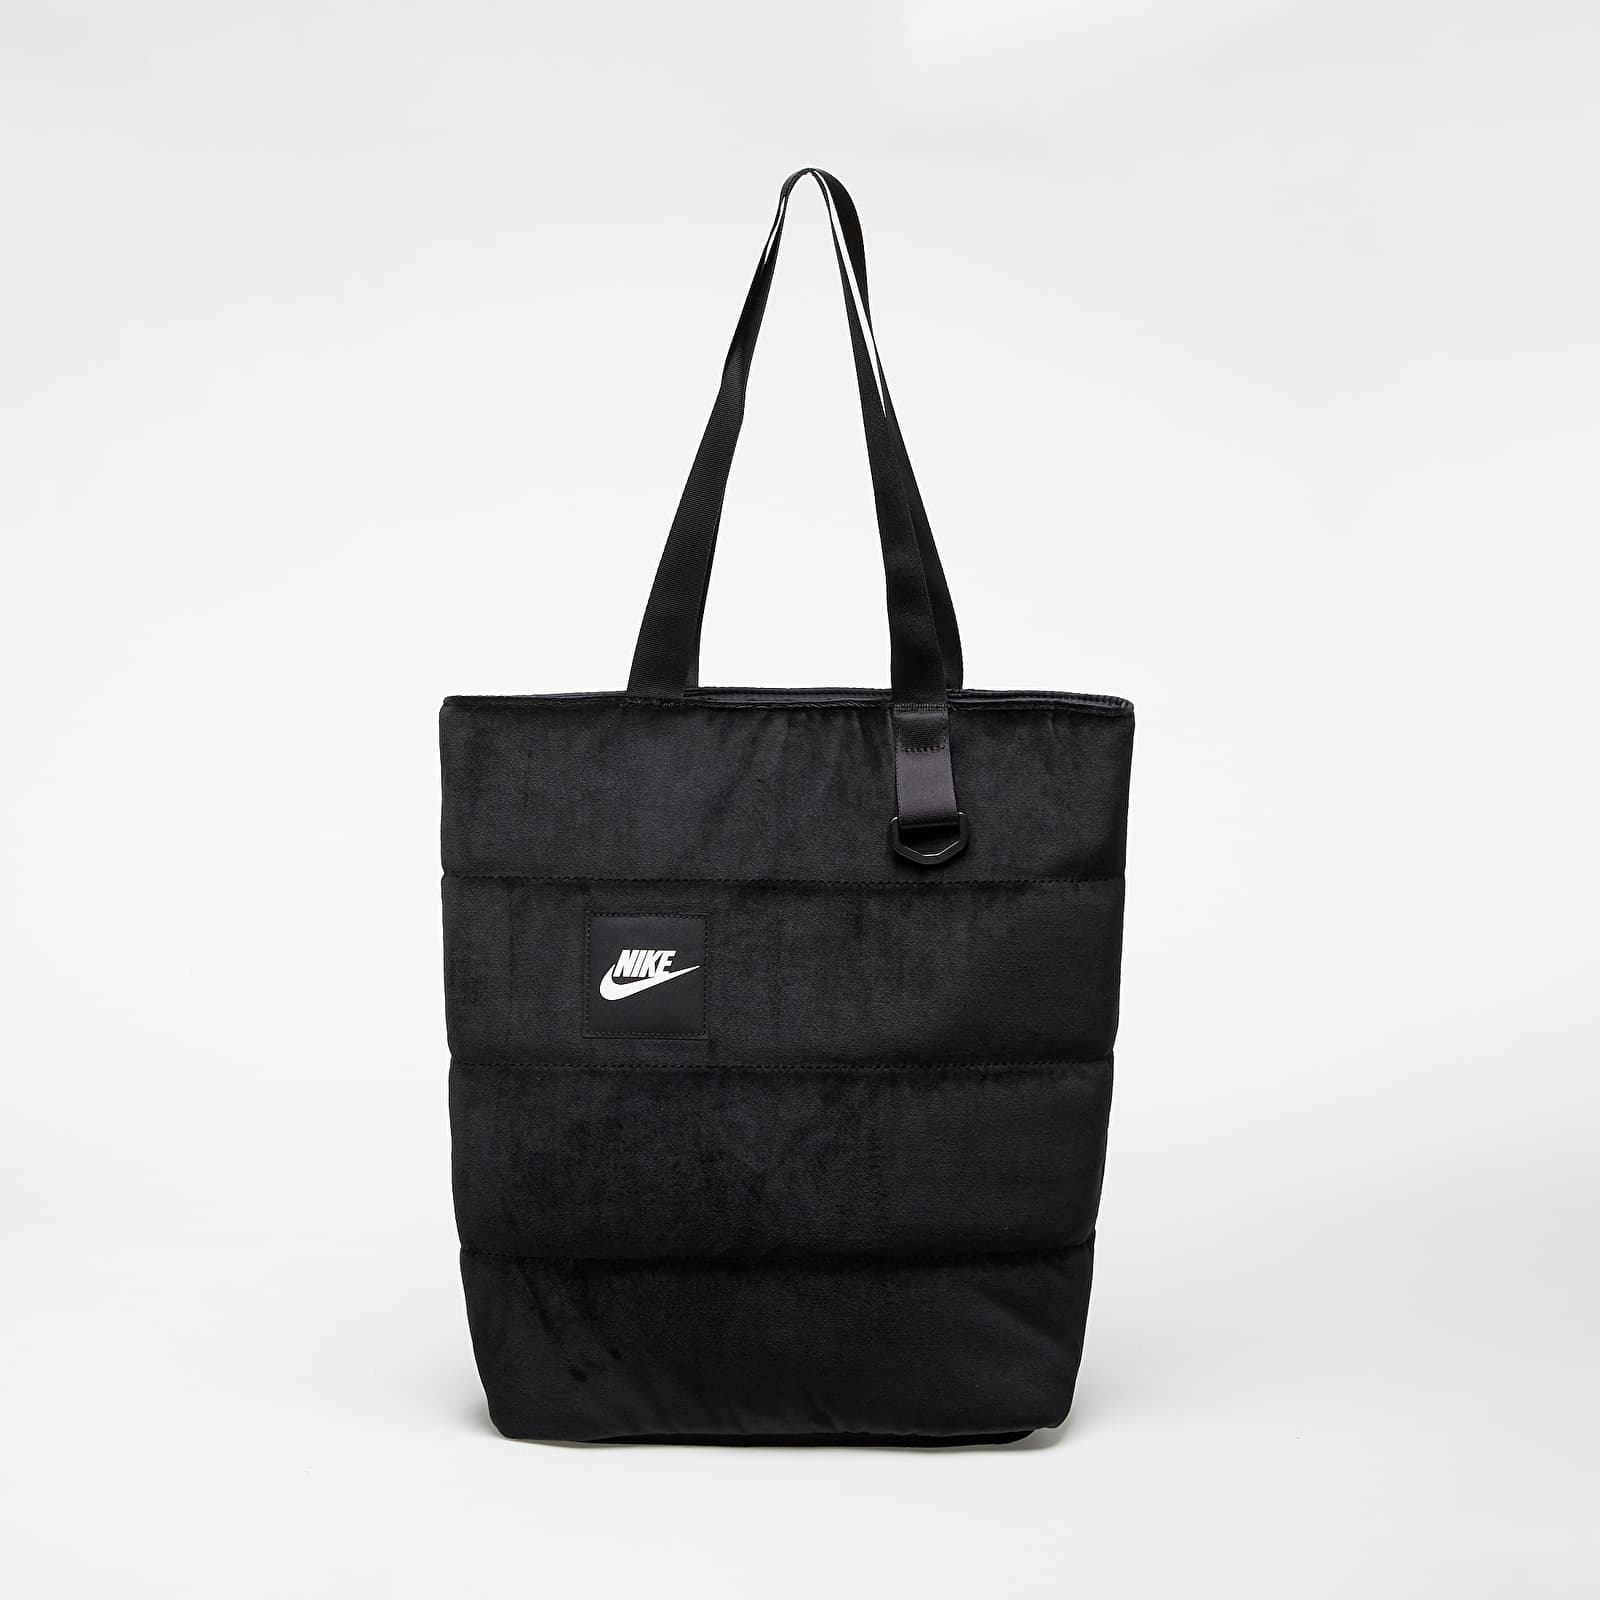 Nike Heritage Tote - Winterized Black/ Black/ White EUR